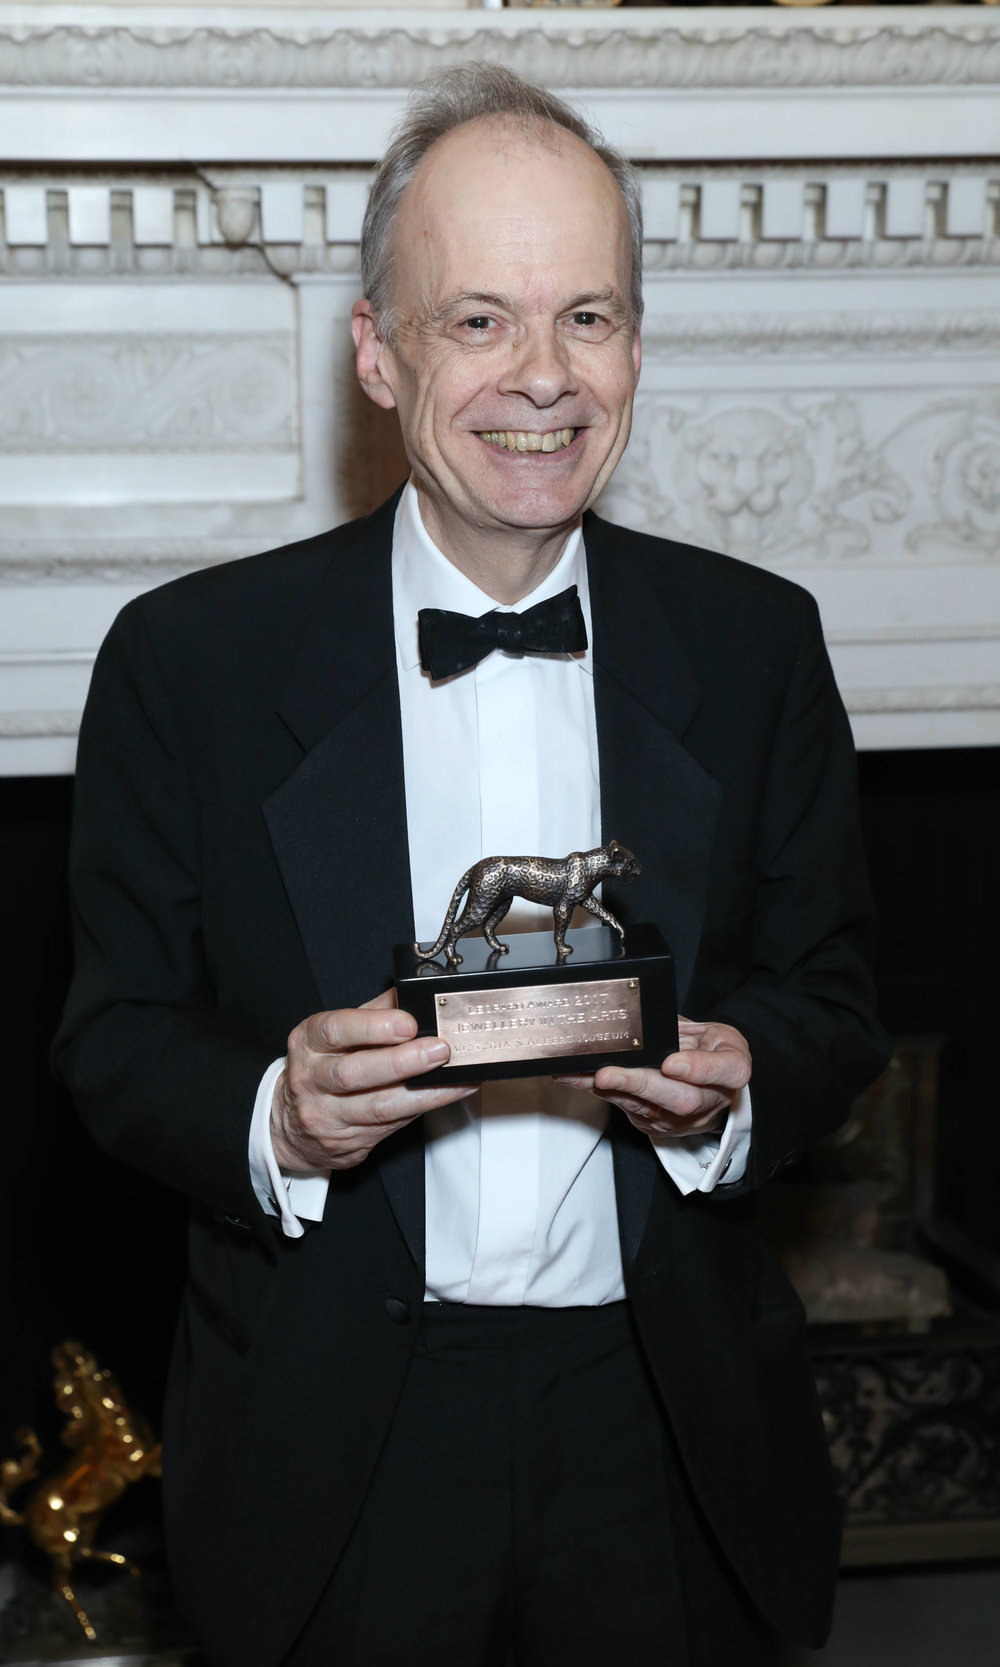 leopard-award-winner-3.jpg